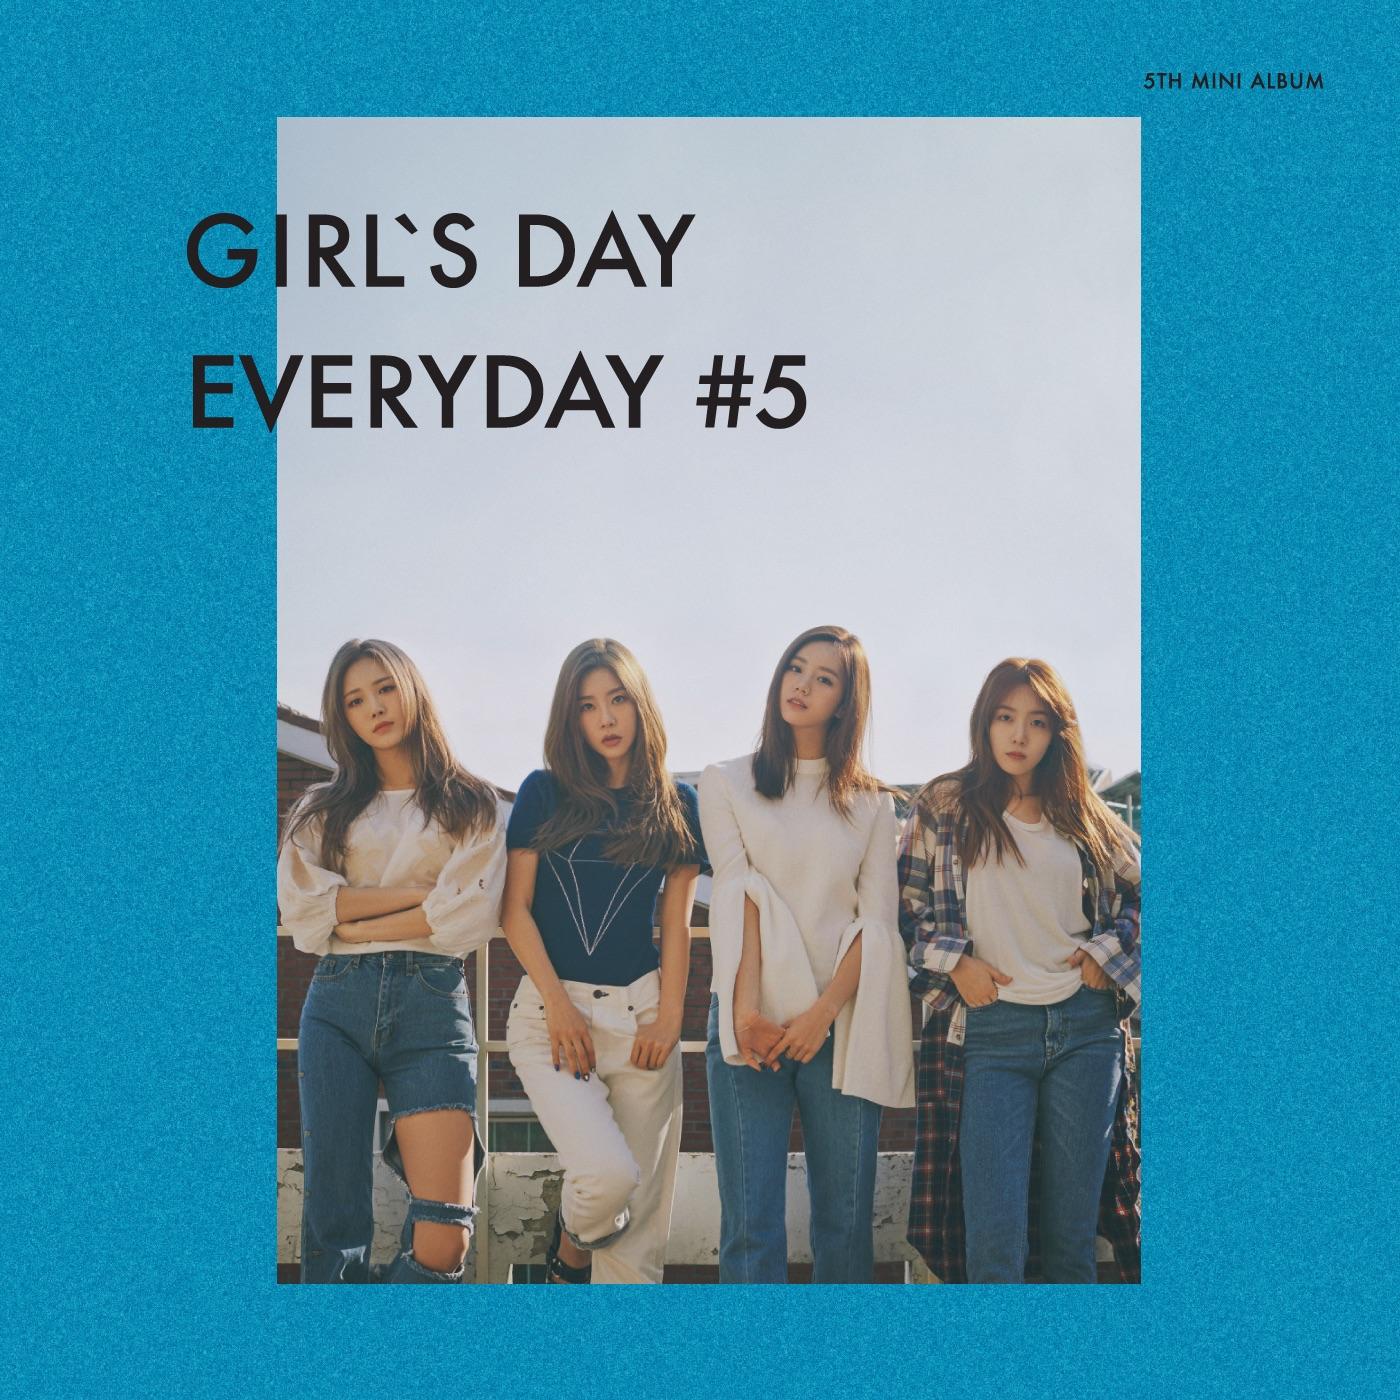 Girl's Day - Girl's Day Everyday #5